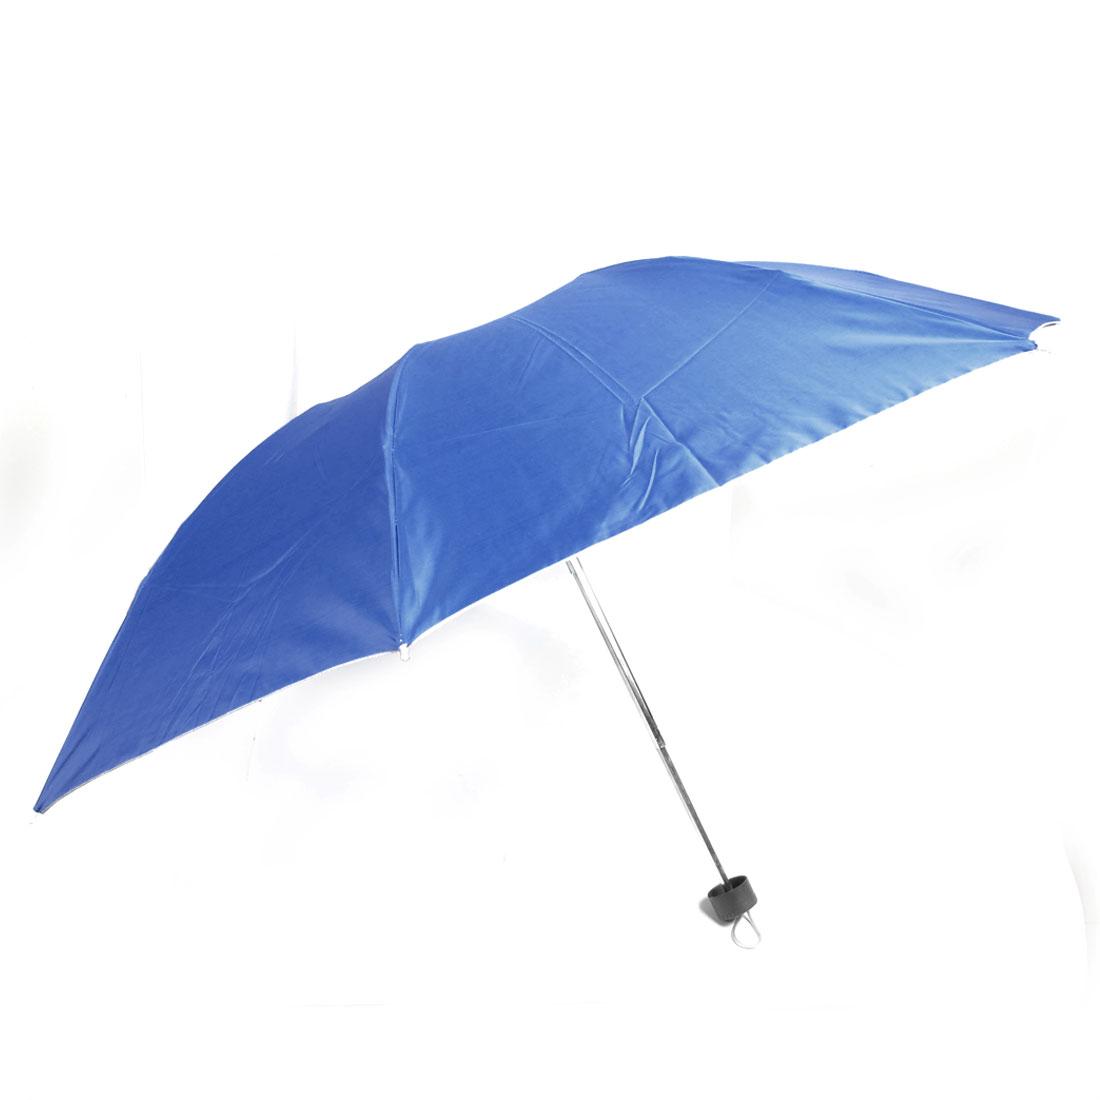 Portable Plastic Handle Metal 3 Sections Shaft Folding Umbrella Blue